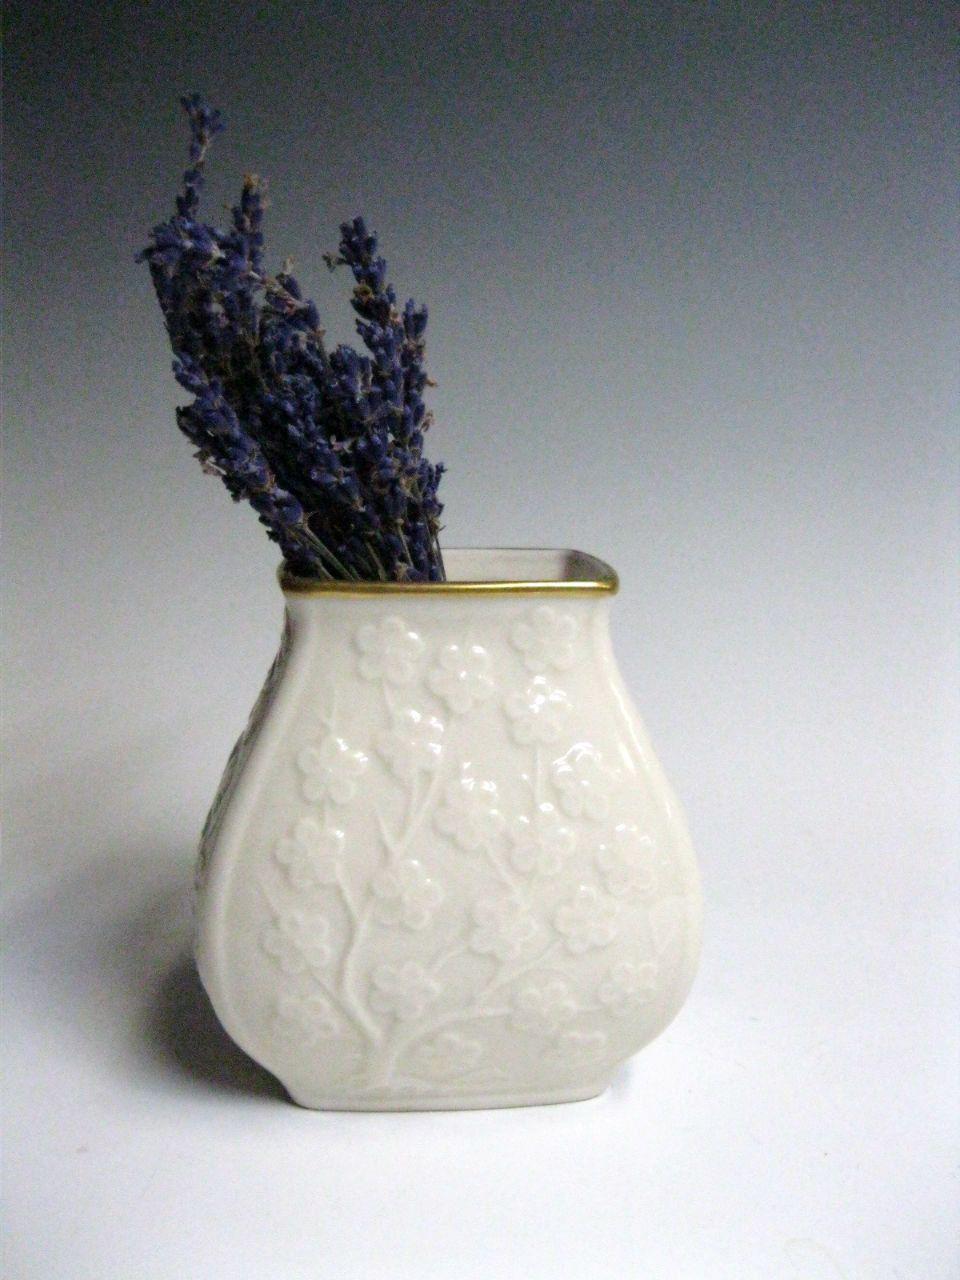 Lenox ivory porcelain vase with gold trim porcelain vase ivory lenox ivory porcelain vase with gold trim floridaeventfo Image collections